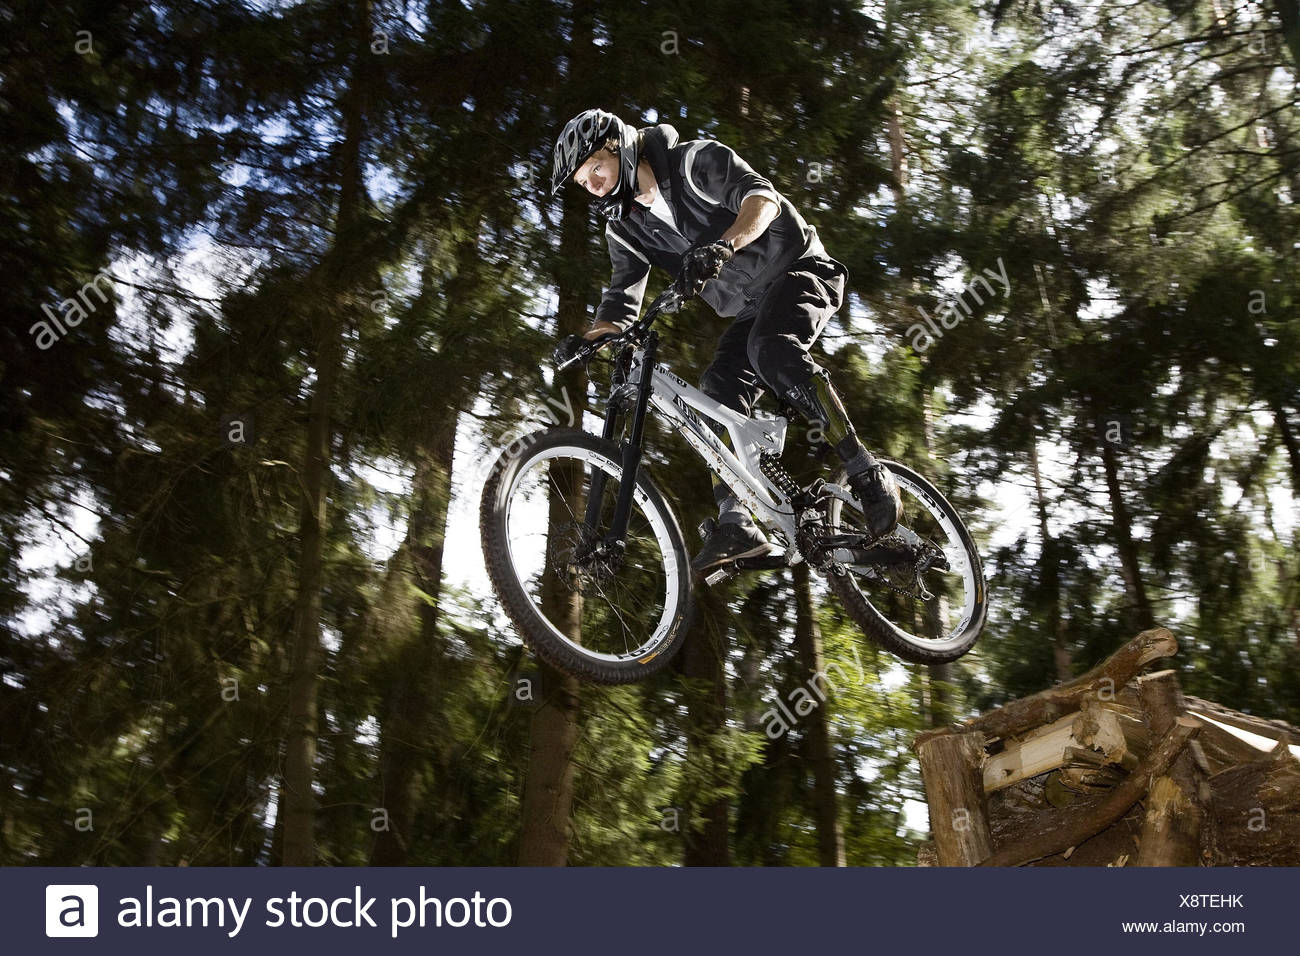 Forest, mountain biker, jump, from below, Stock Photo